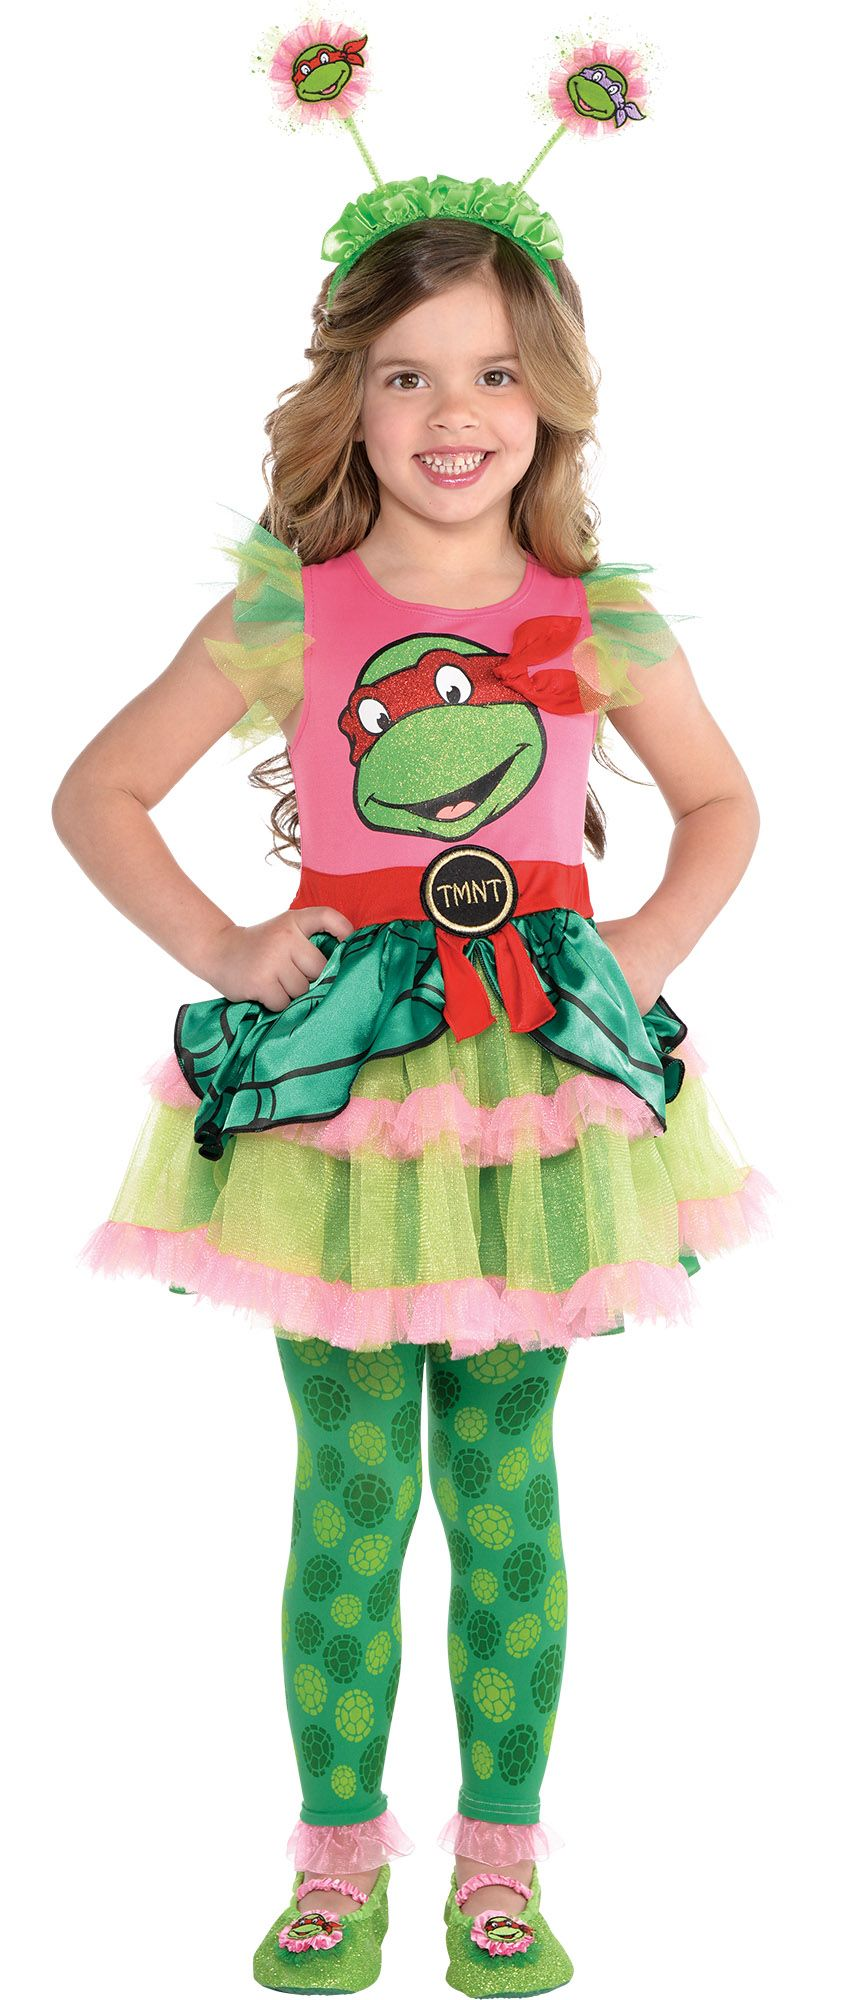 Create Your Own Look - Girl Teenage Mutant Ninja Turtle Dress #2